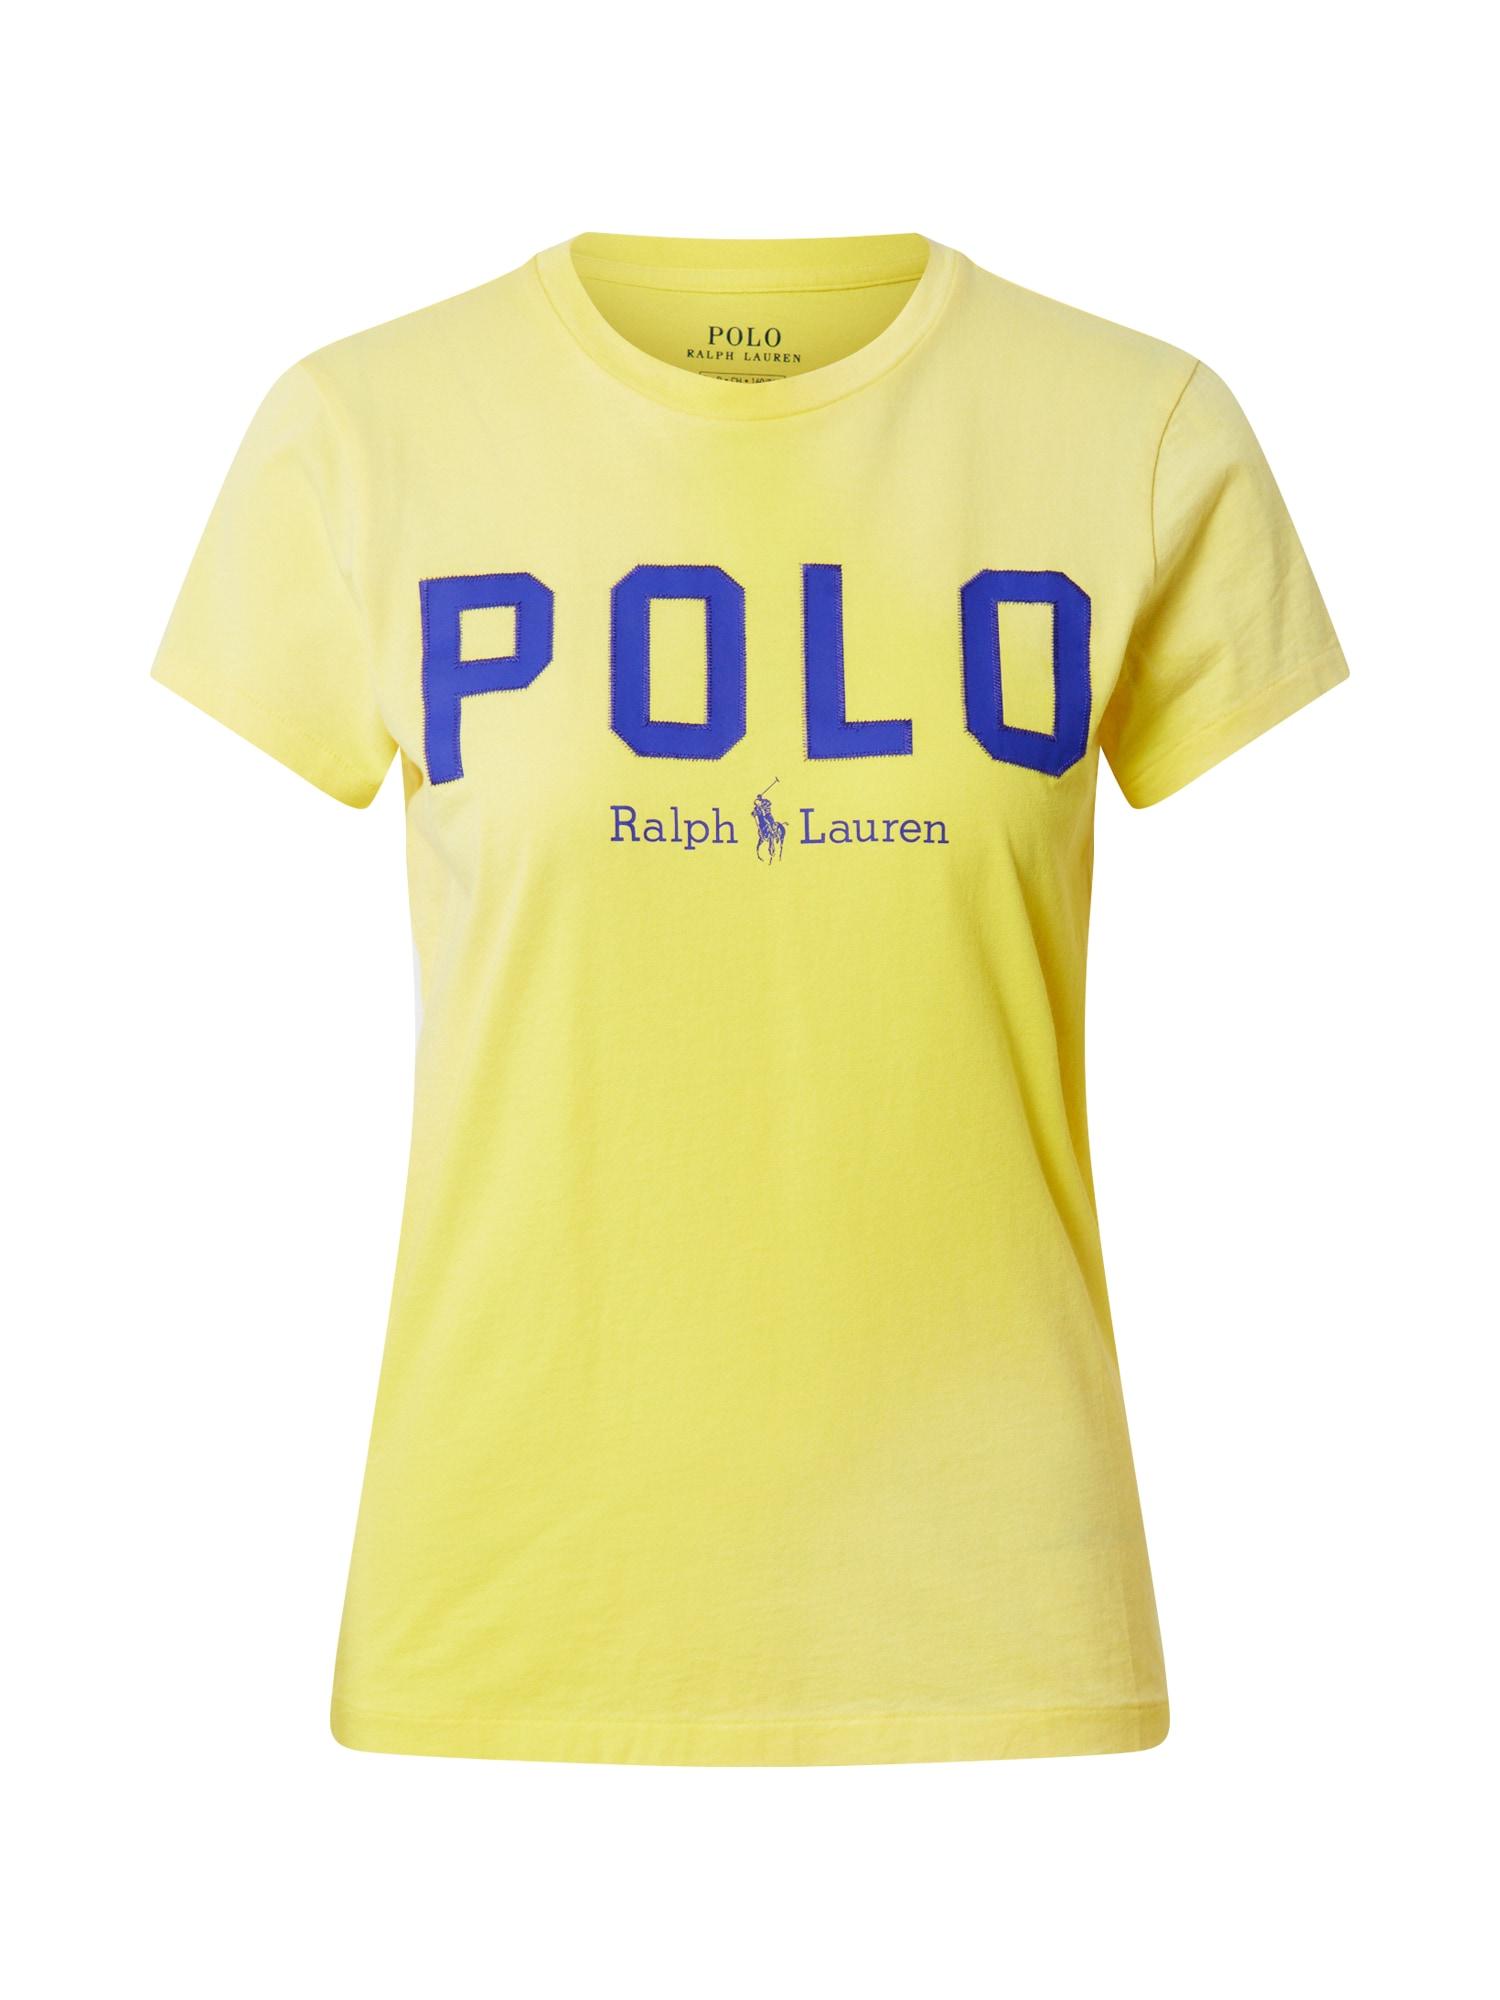 POLO RALPH LAUREN Tričko  žlté / tmavomodrá